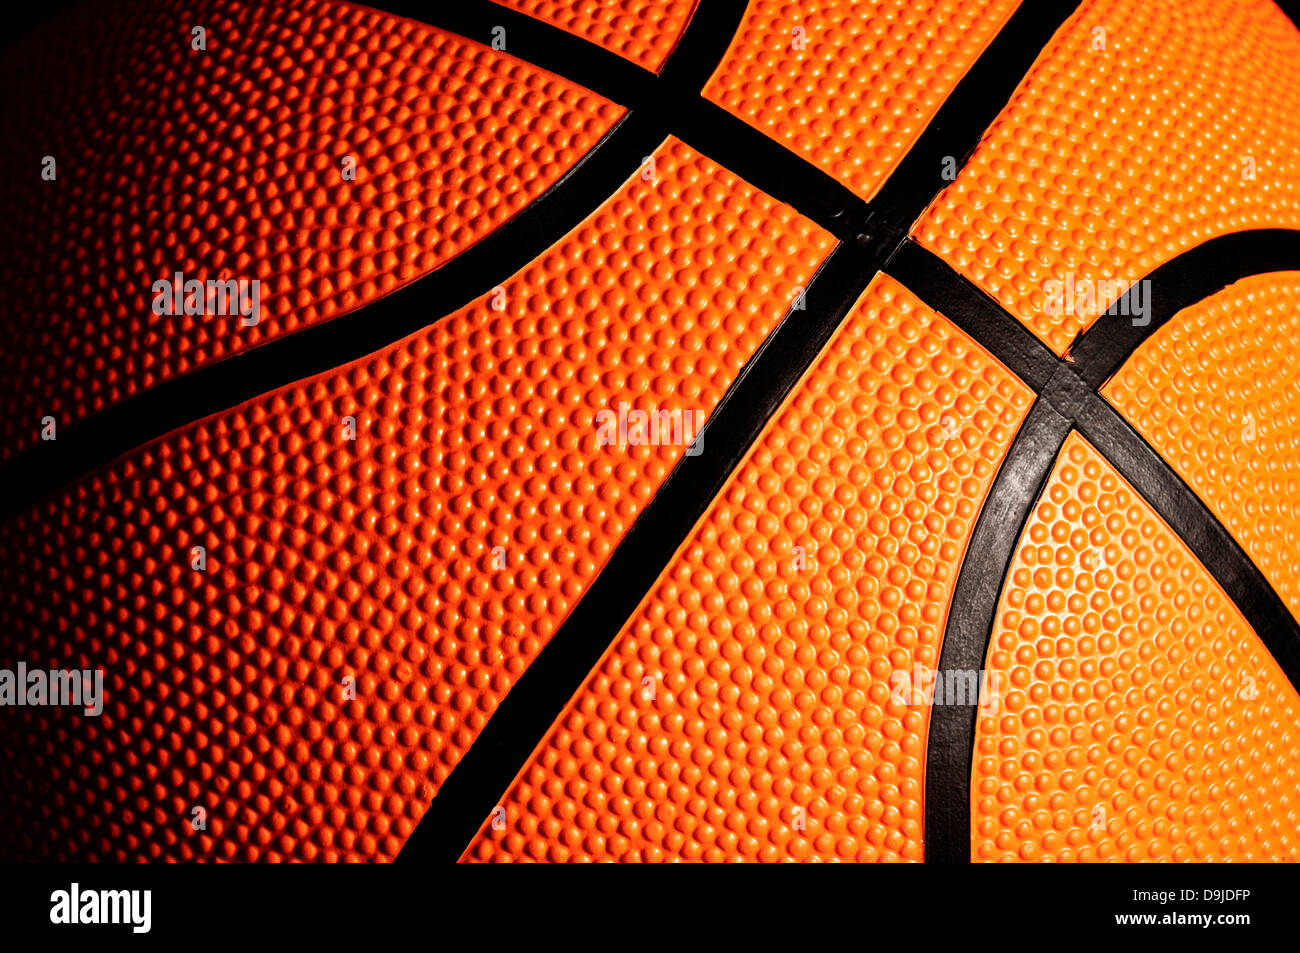 Detalle de una pelota de baloncesto Foto de stock